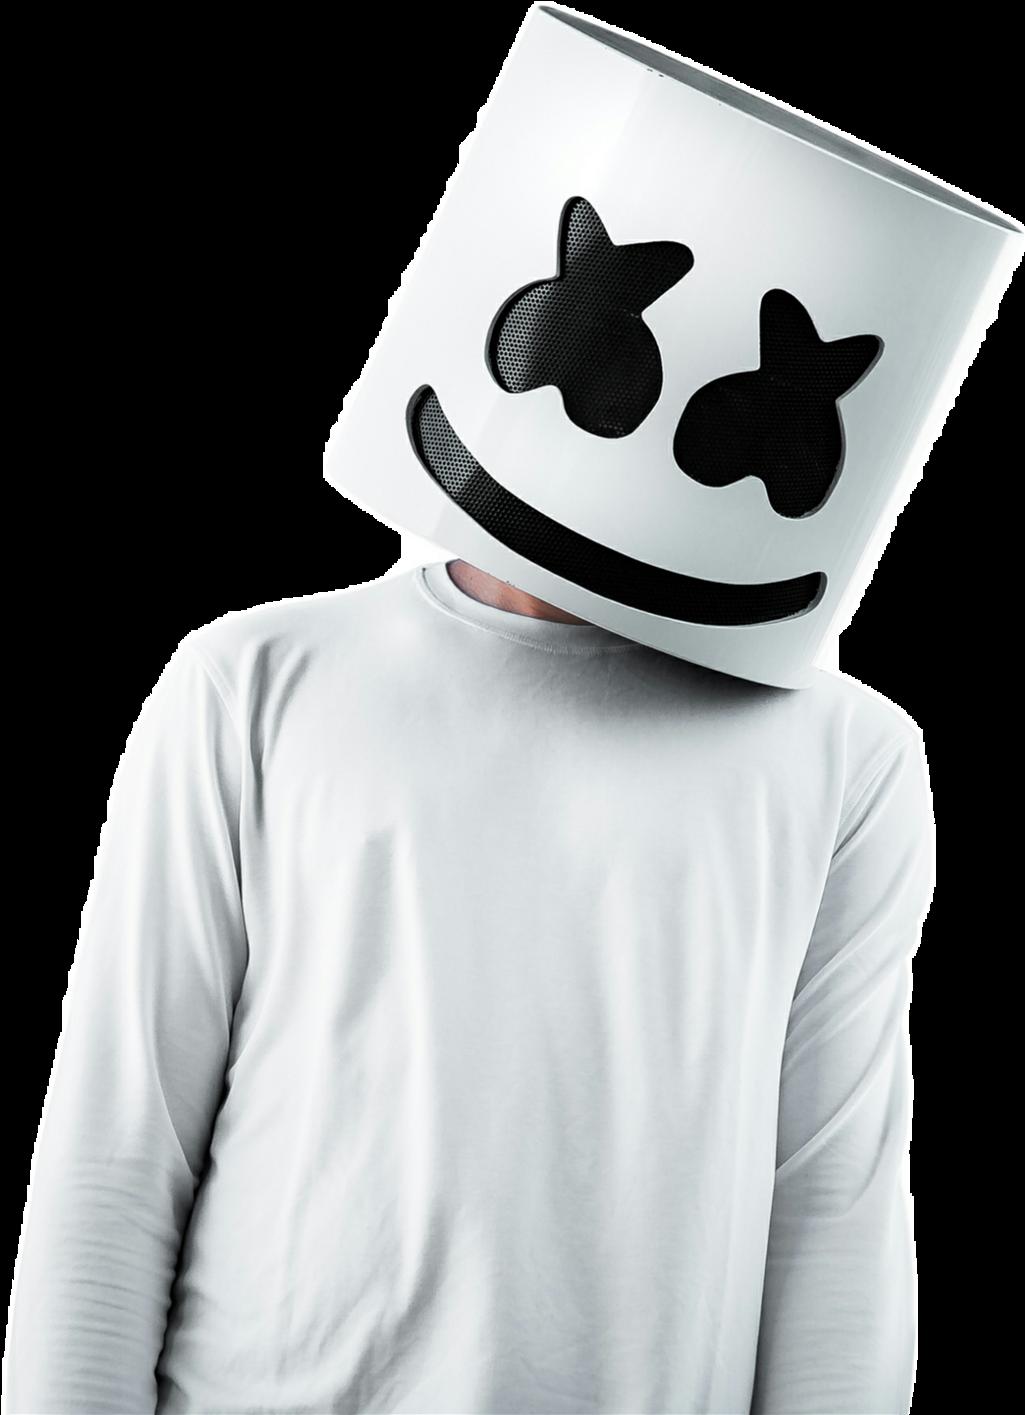 Marshmallow Marshmellow Dude Cool - Marshmello Wallpaper Iphone Hd (1024x1414), Png Download